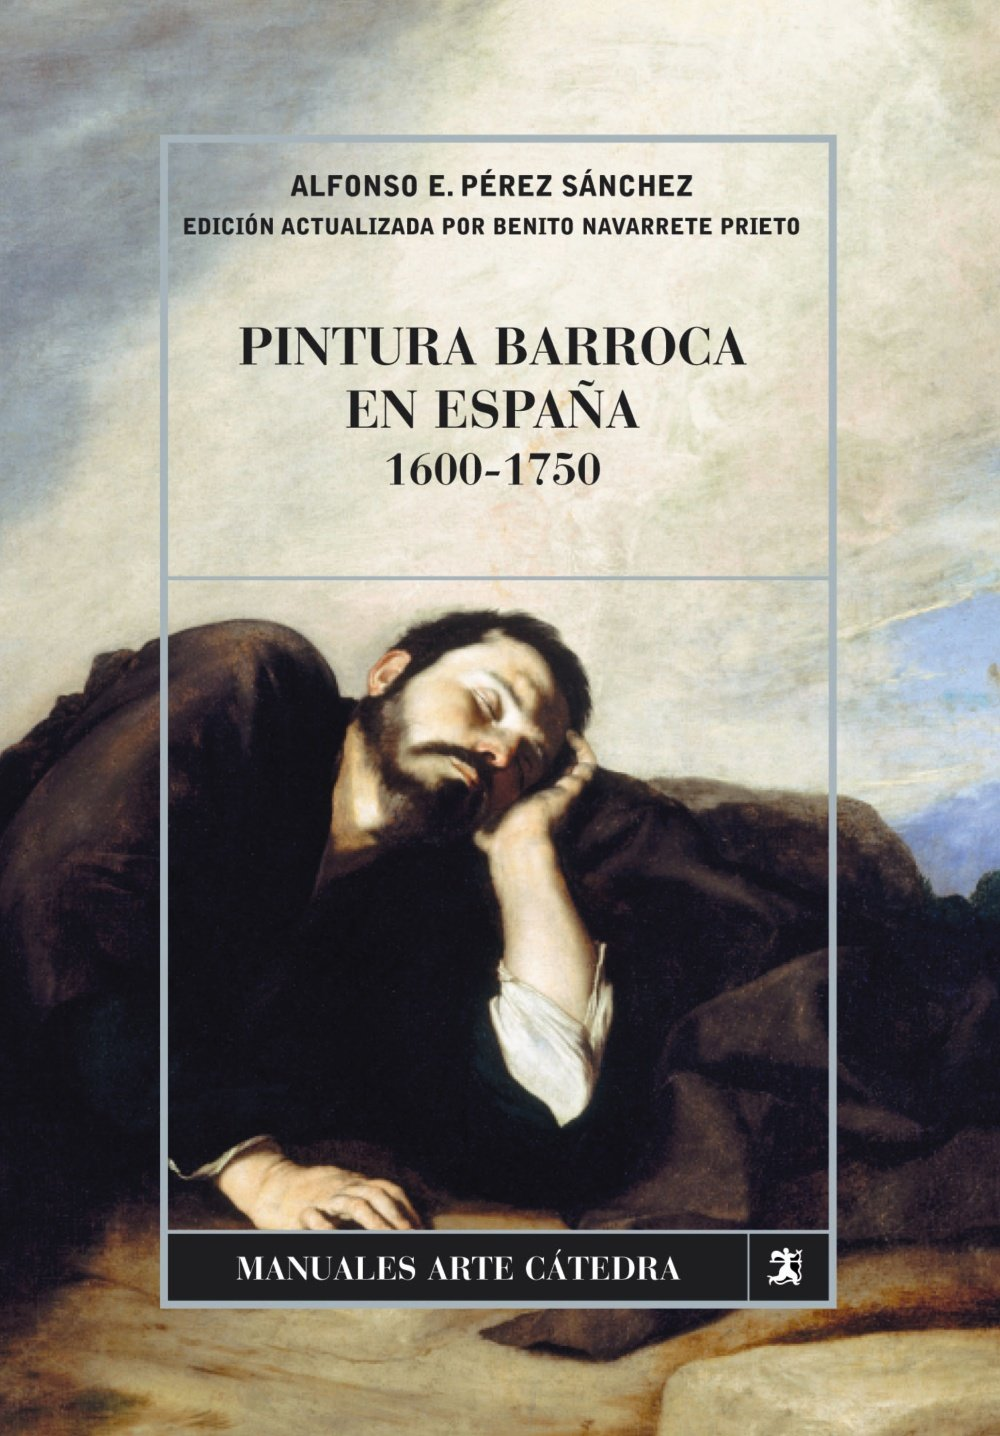 Pintura barroca en España, 1600-1750 Manuales Arte Cátedra: Amazon.es: Pérez Sánchez, Alfonso: Libros